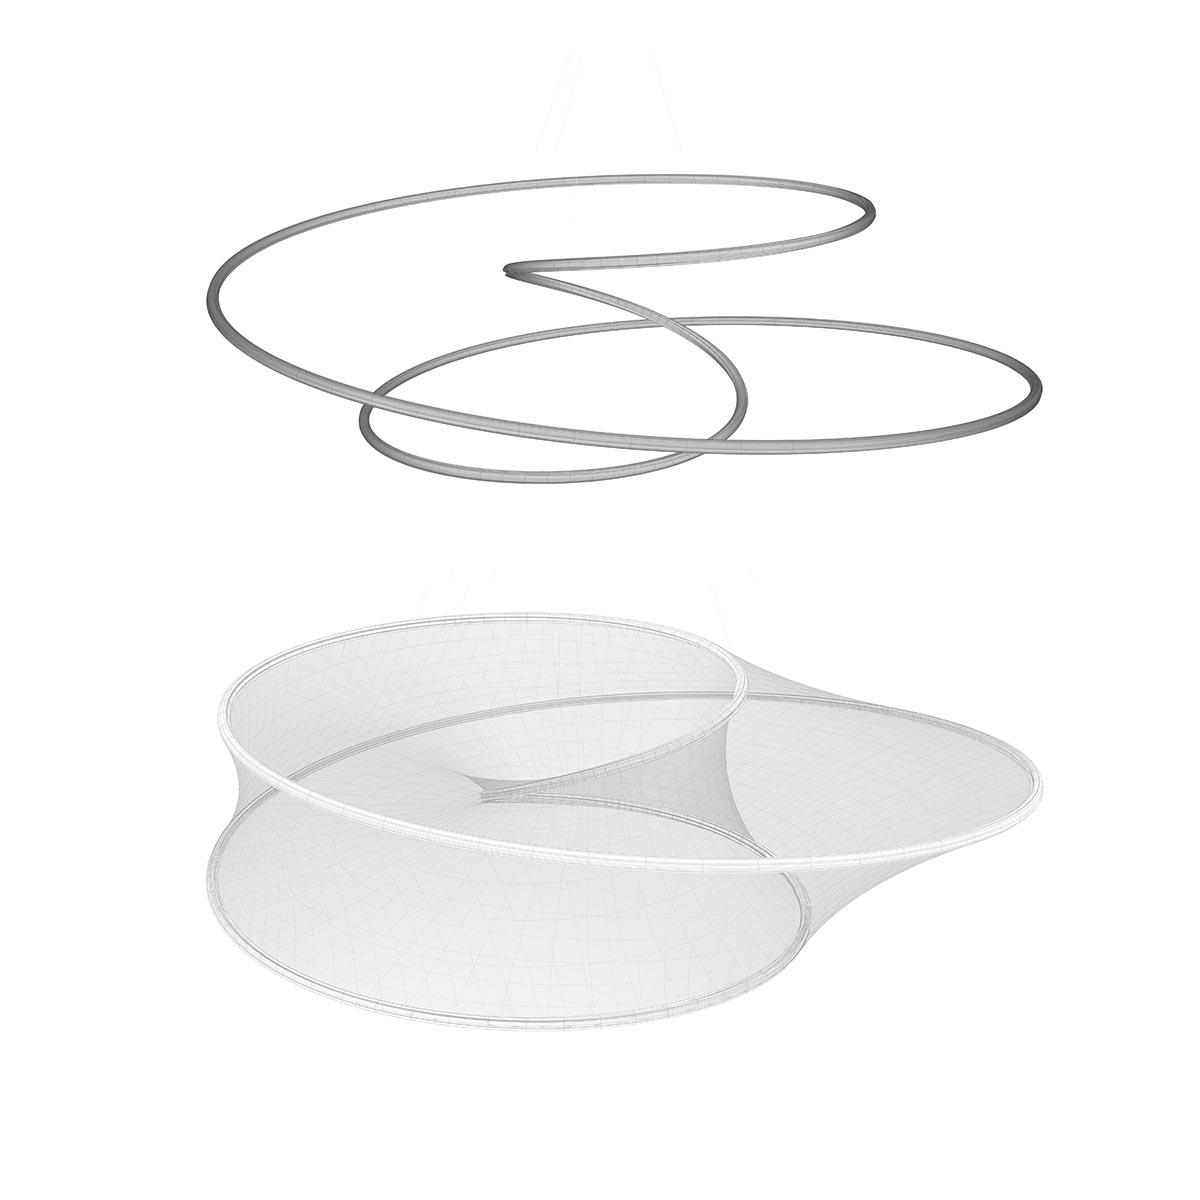 barrisol-infinite-loop-ross-lovegrove-computational-design-andrea-locatelli-01.jpg